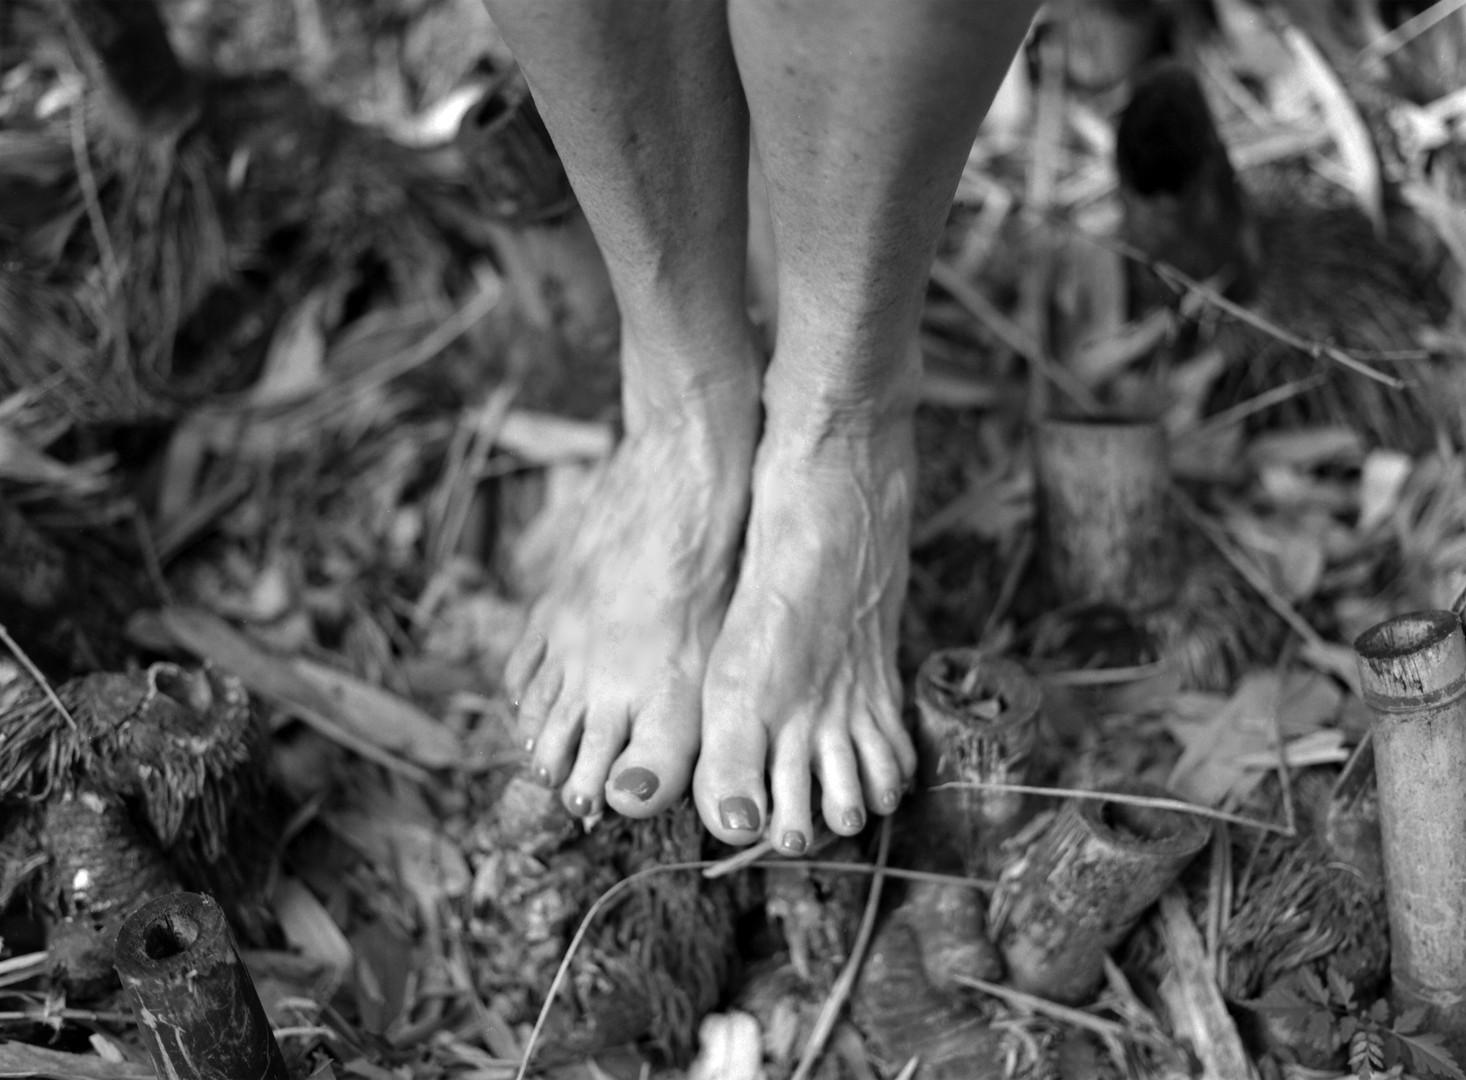 Nancy's Feet